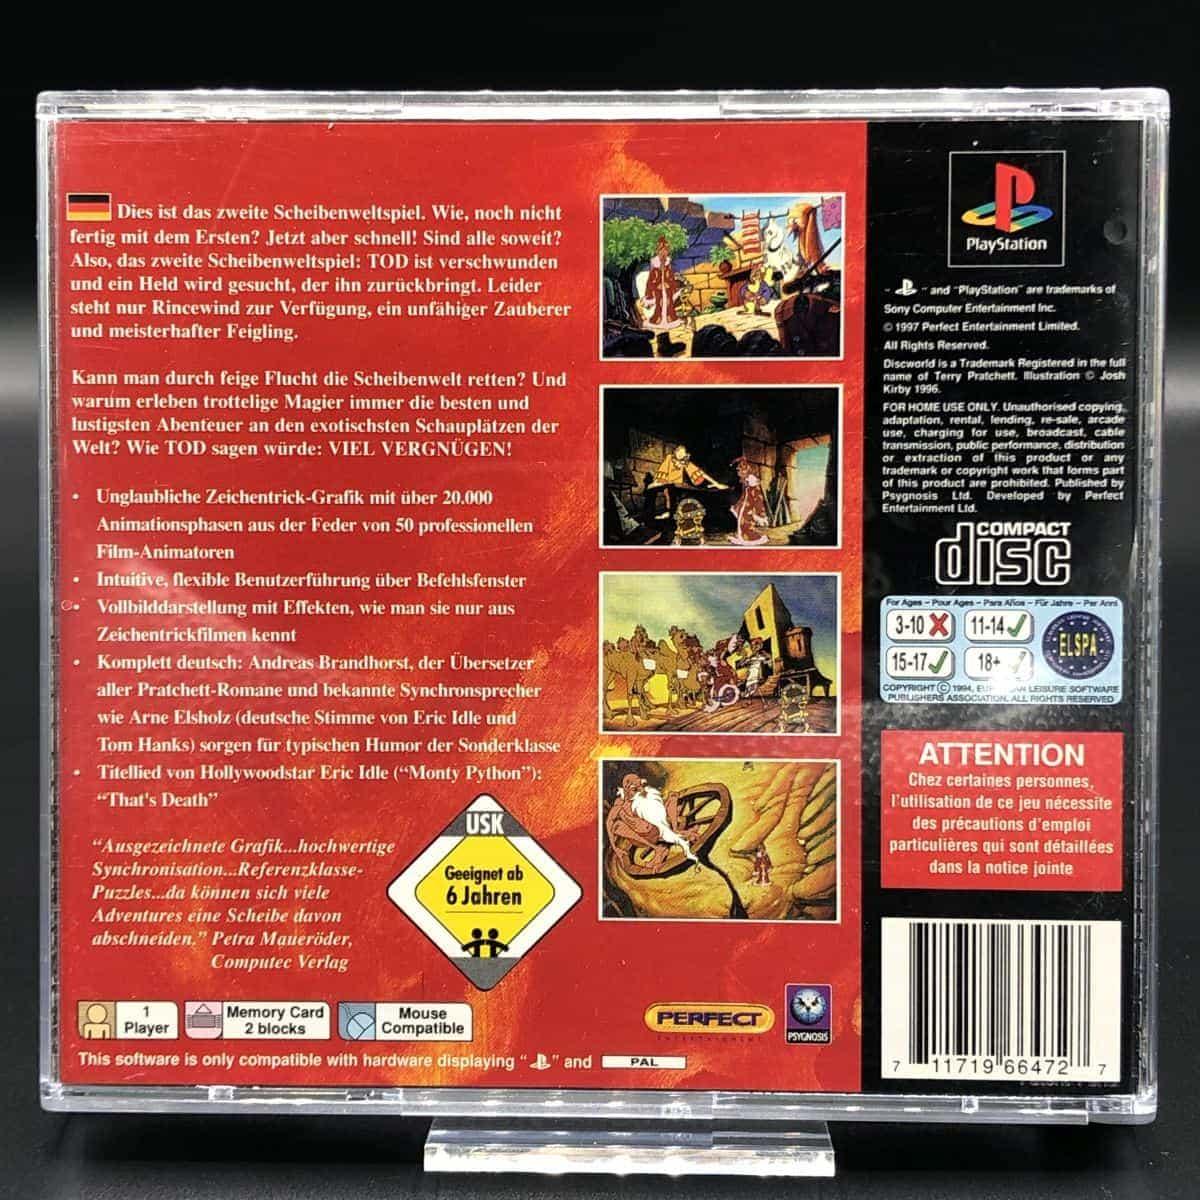 PS1 Discworld II Vermutlich Vermisst..!? (Komplett) (Sehr gut) Sony PlayStation 1